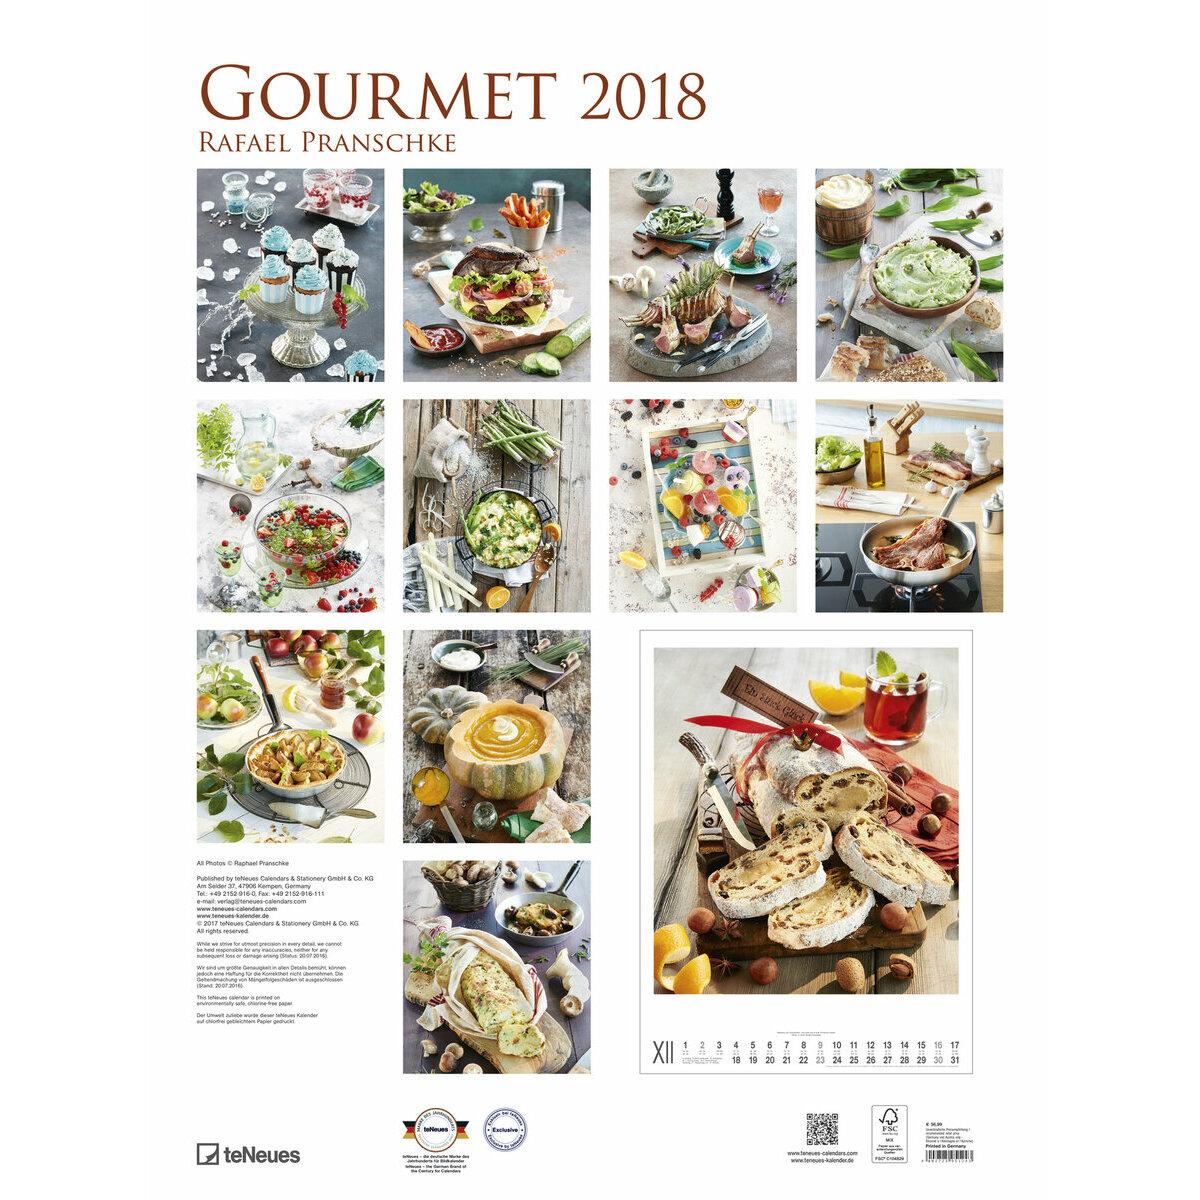 Maxi calendrier poster 2018 cuisine gourmande par rafael for Cuisine gourmande